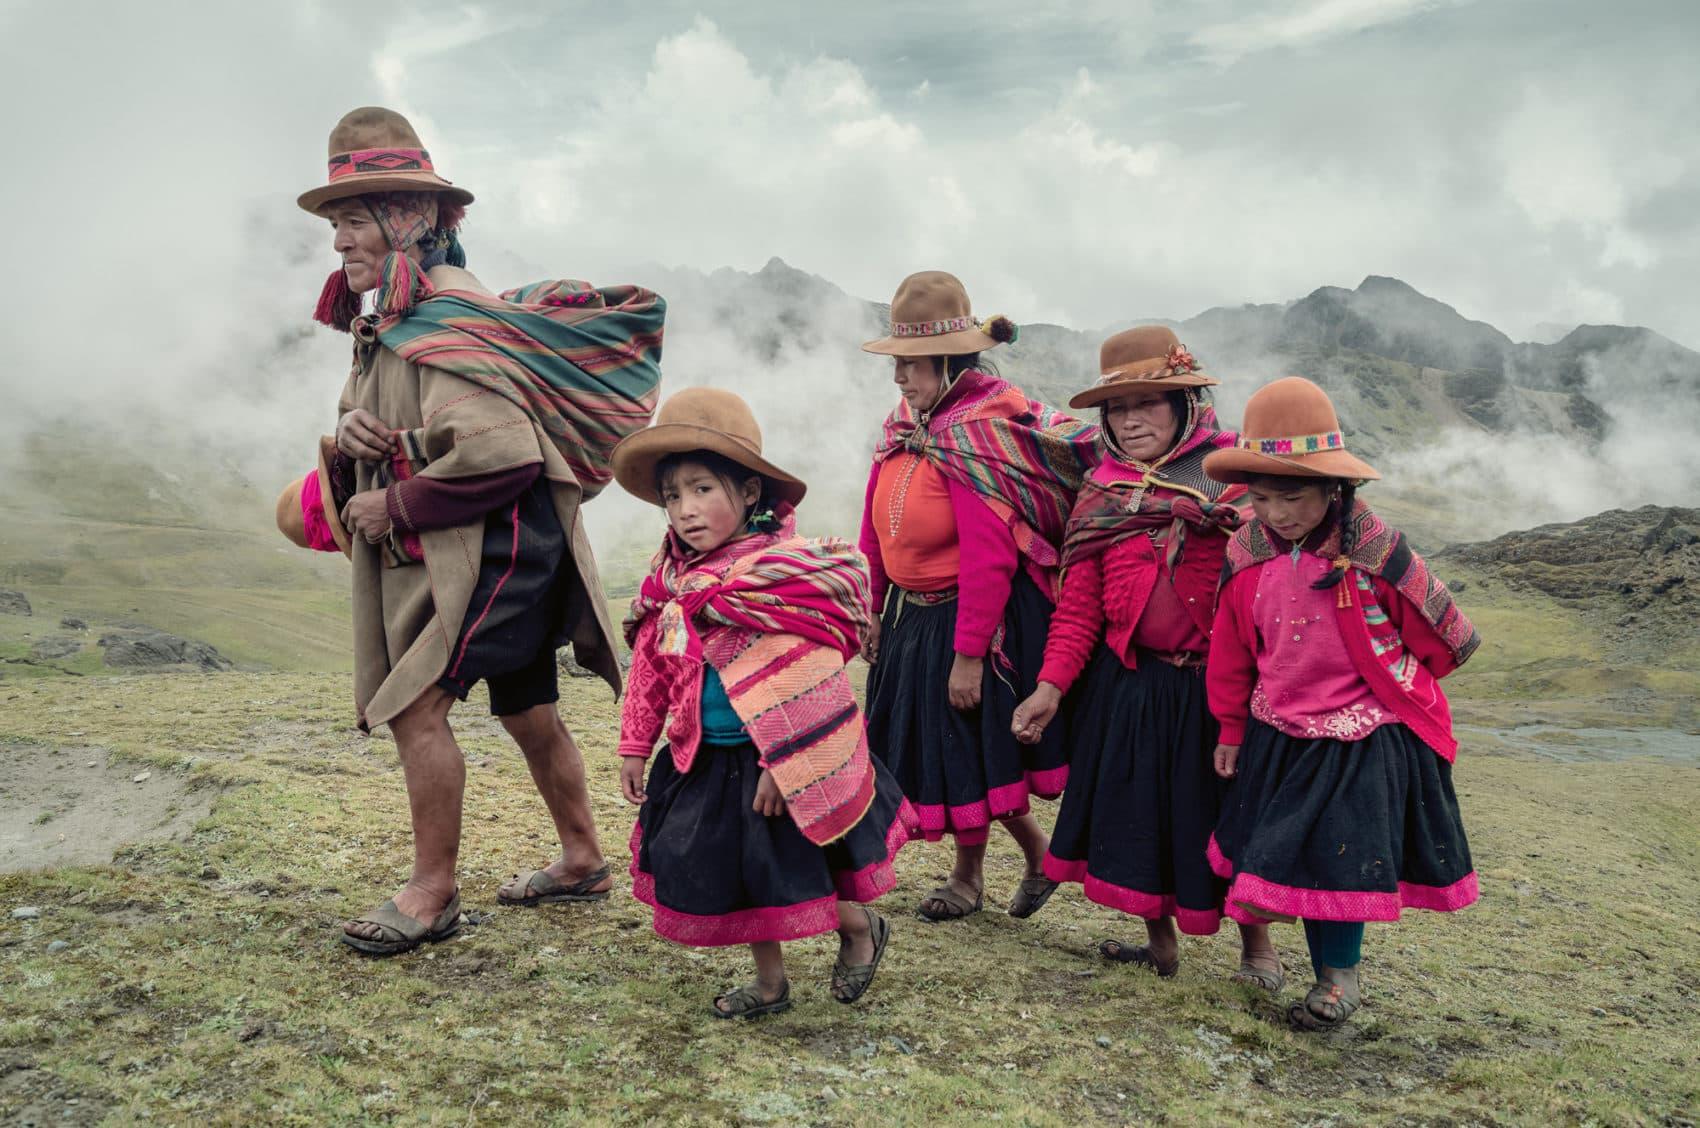 Q'ero | Qochamoqo, Hatun Q'eros, Andes | Peru 2018 (© Jimmy Nelson Pictures BV)